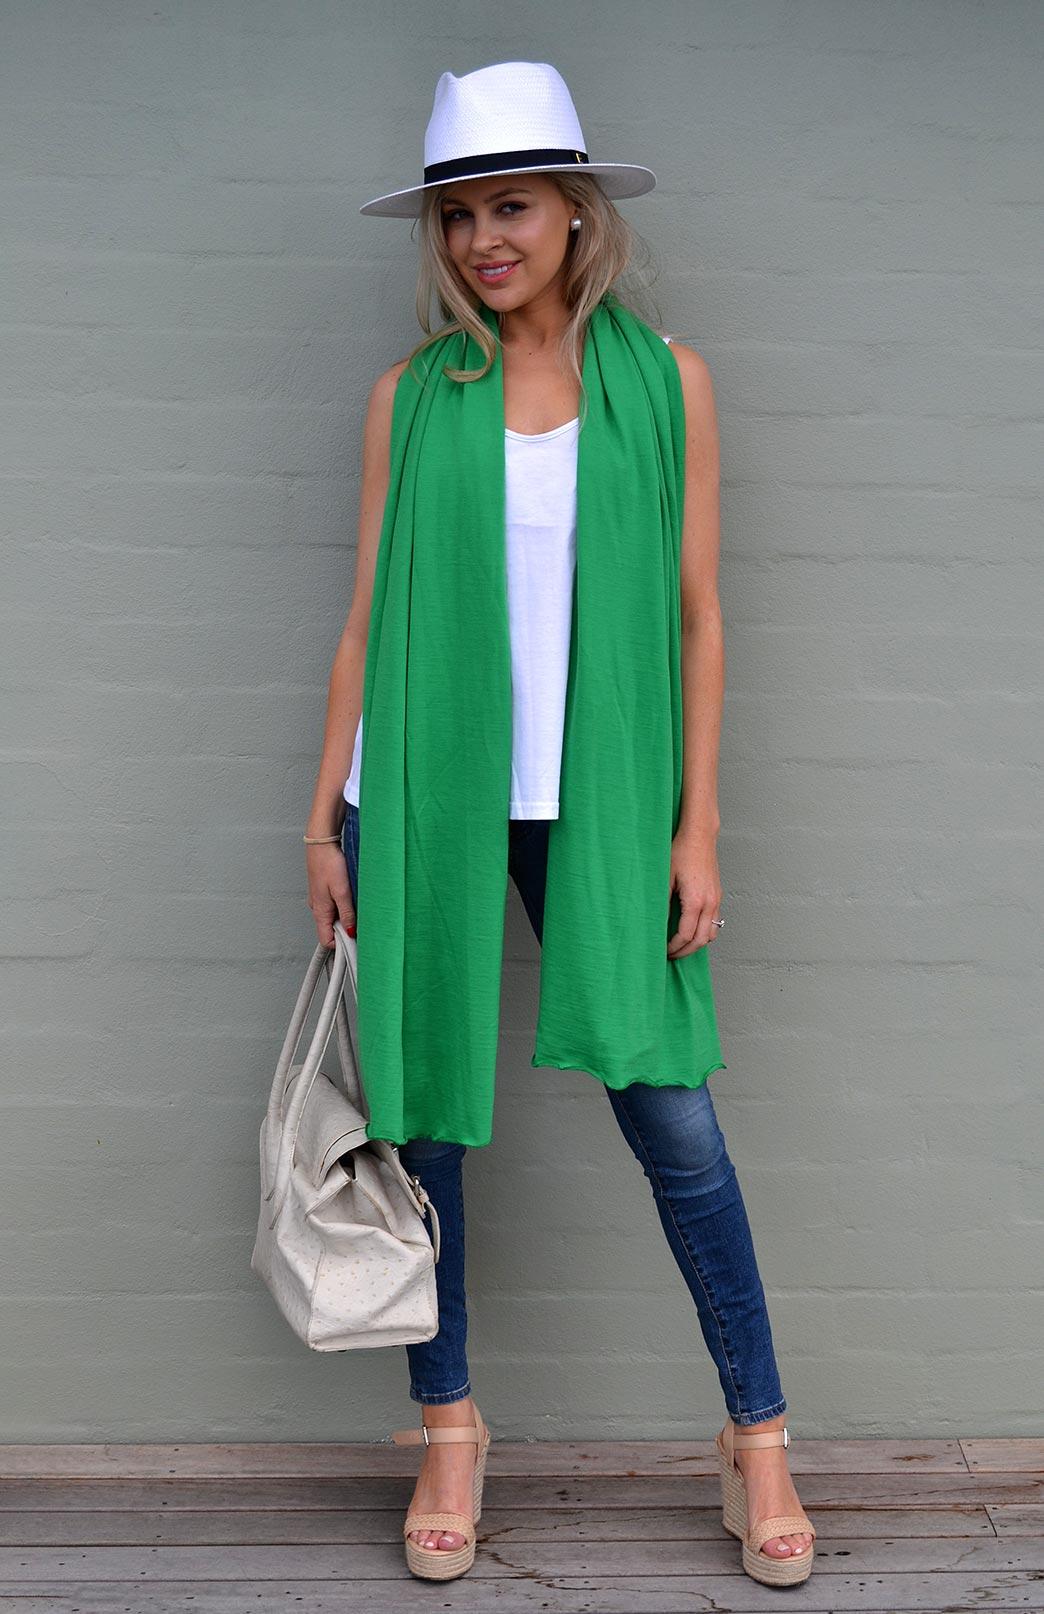 Scarves - Lightweight - Women's Superfine Merino Wool Classic Wide Scarf - Smitten Merino Tasmania Australia